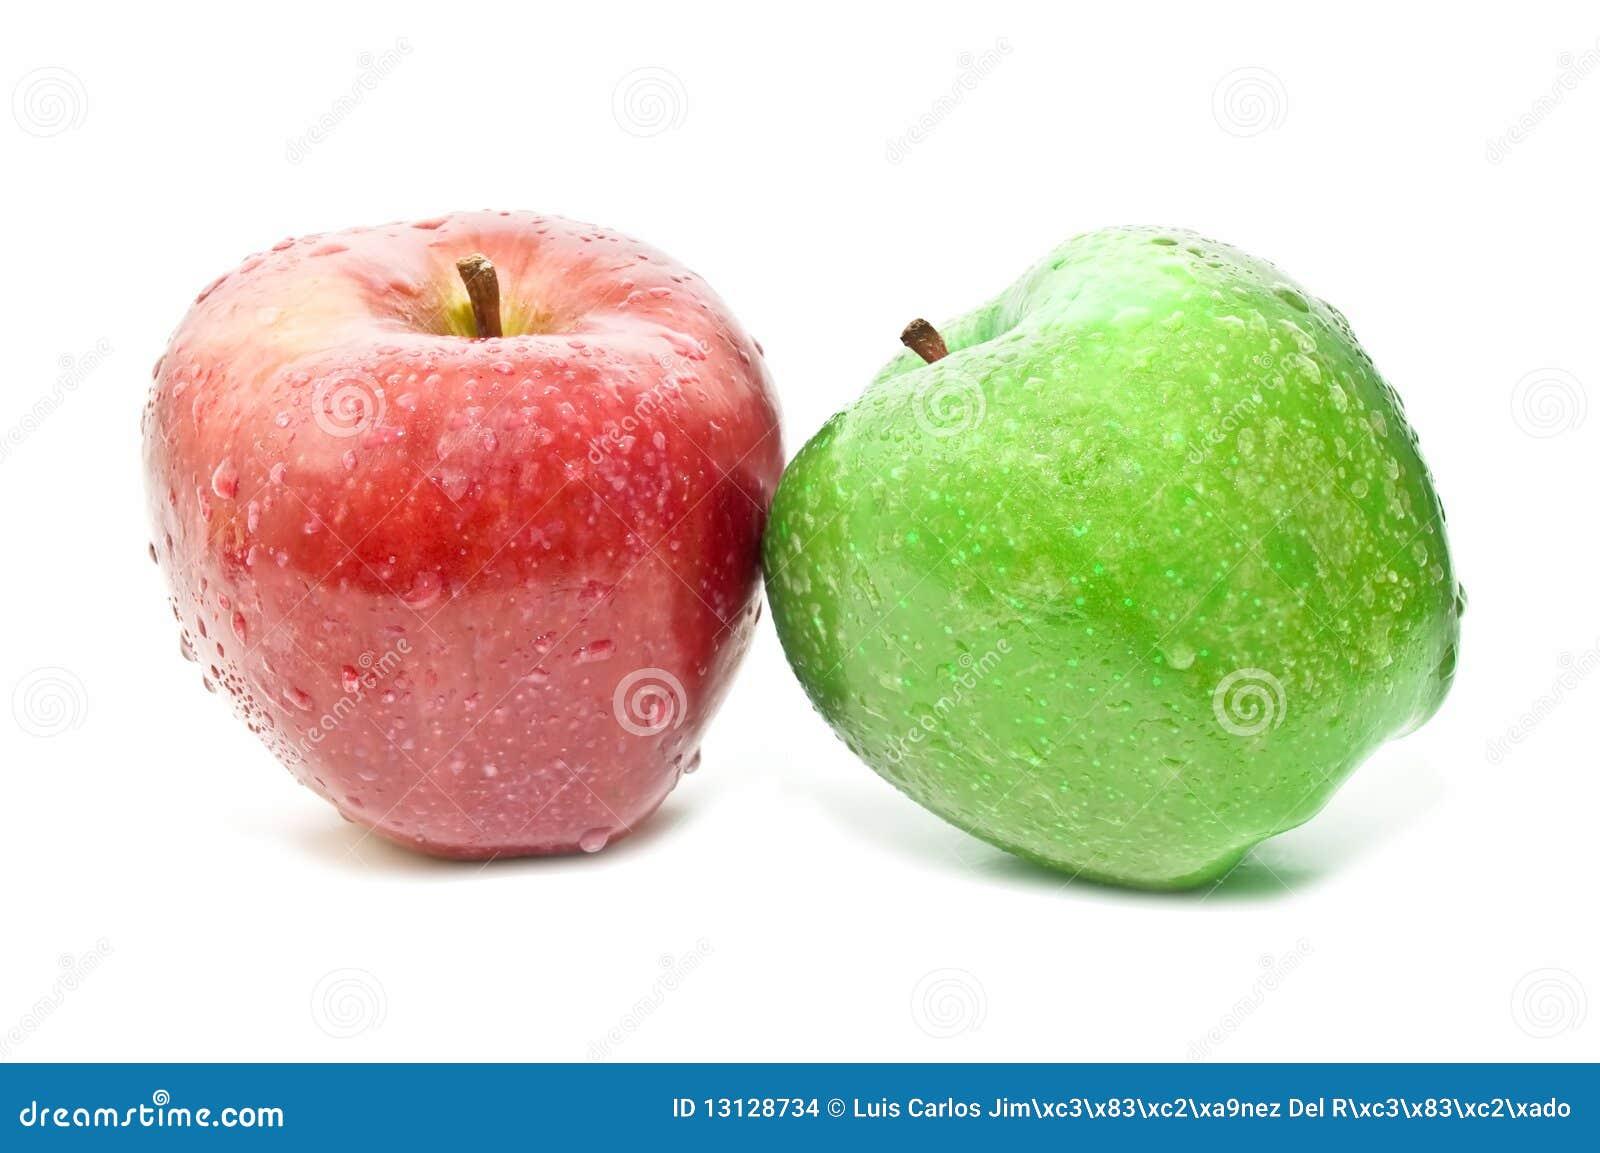 rode appel en groene appel stock foto afbeelding bestaande uit verfraai 13128734. Black Bedroom Furniture Sets. Home Design Ideas